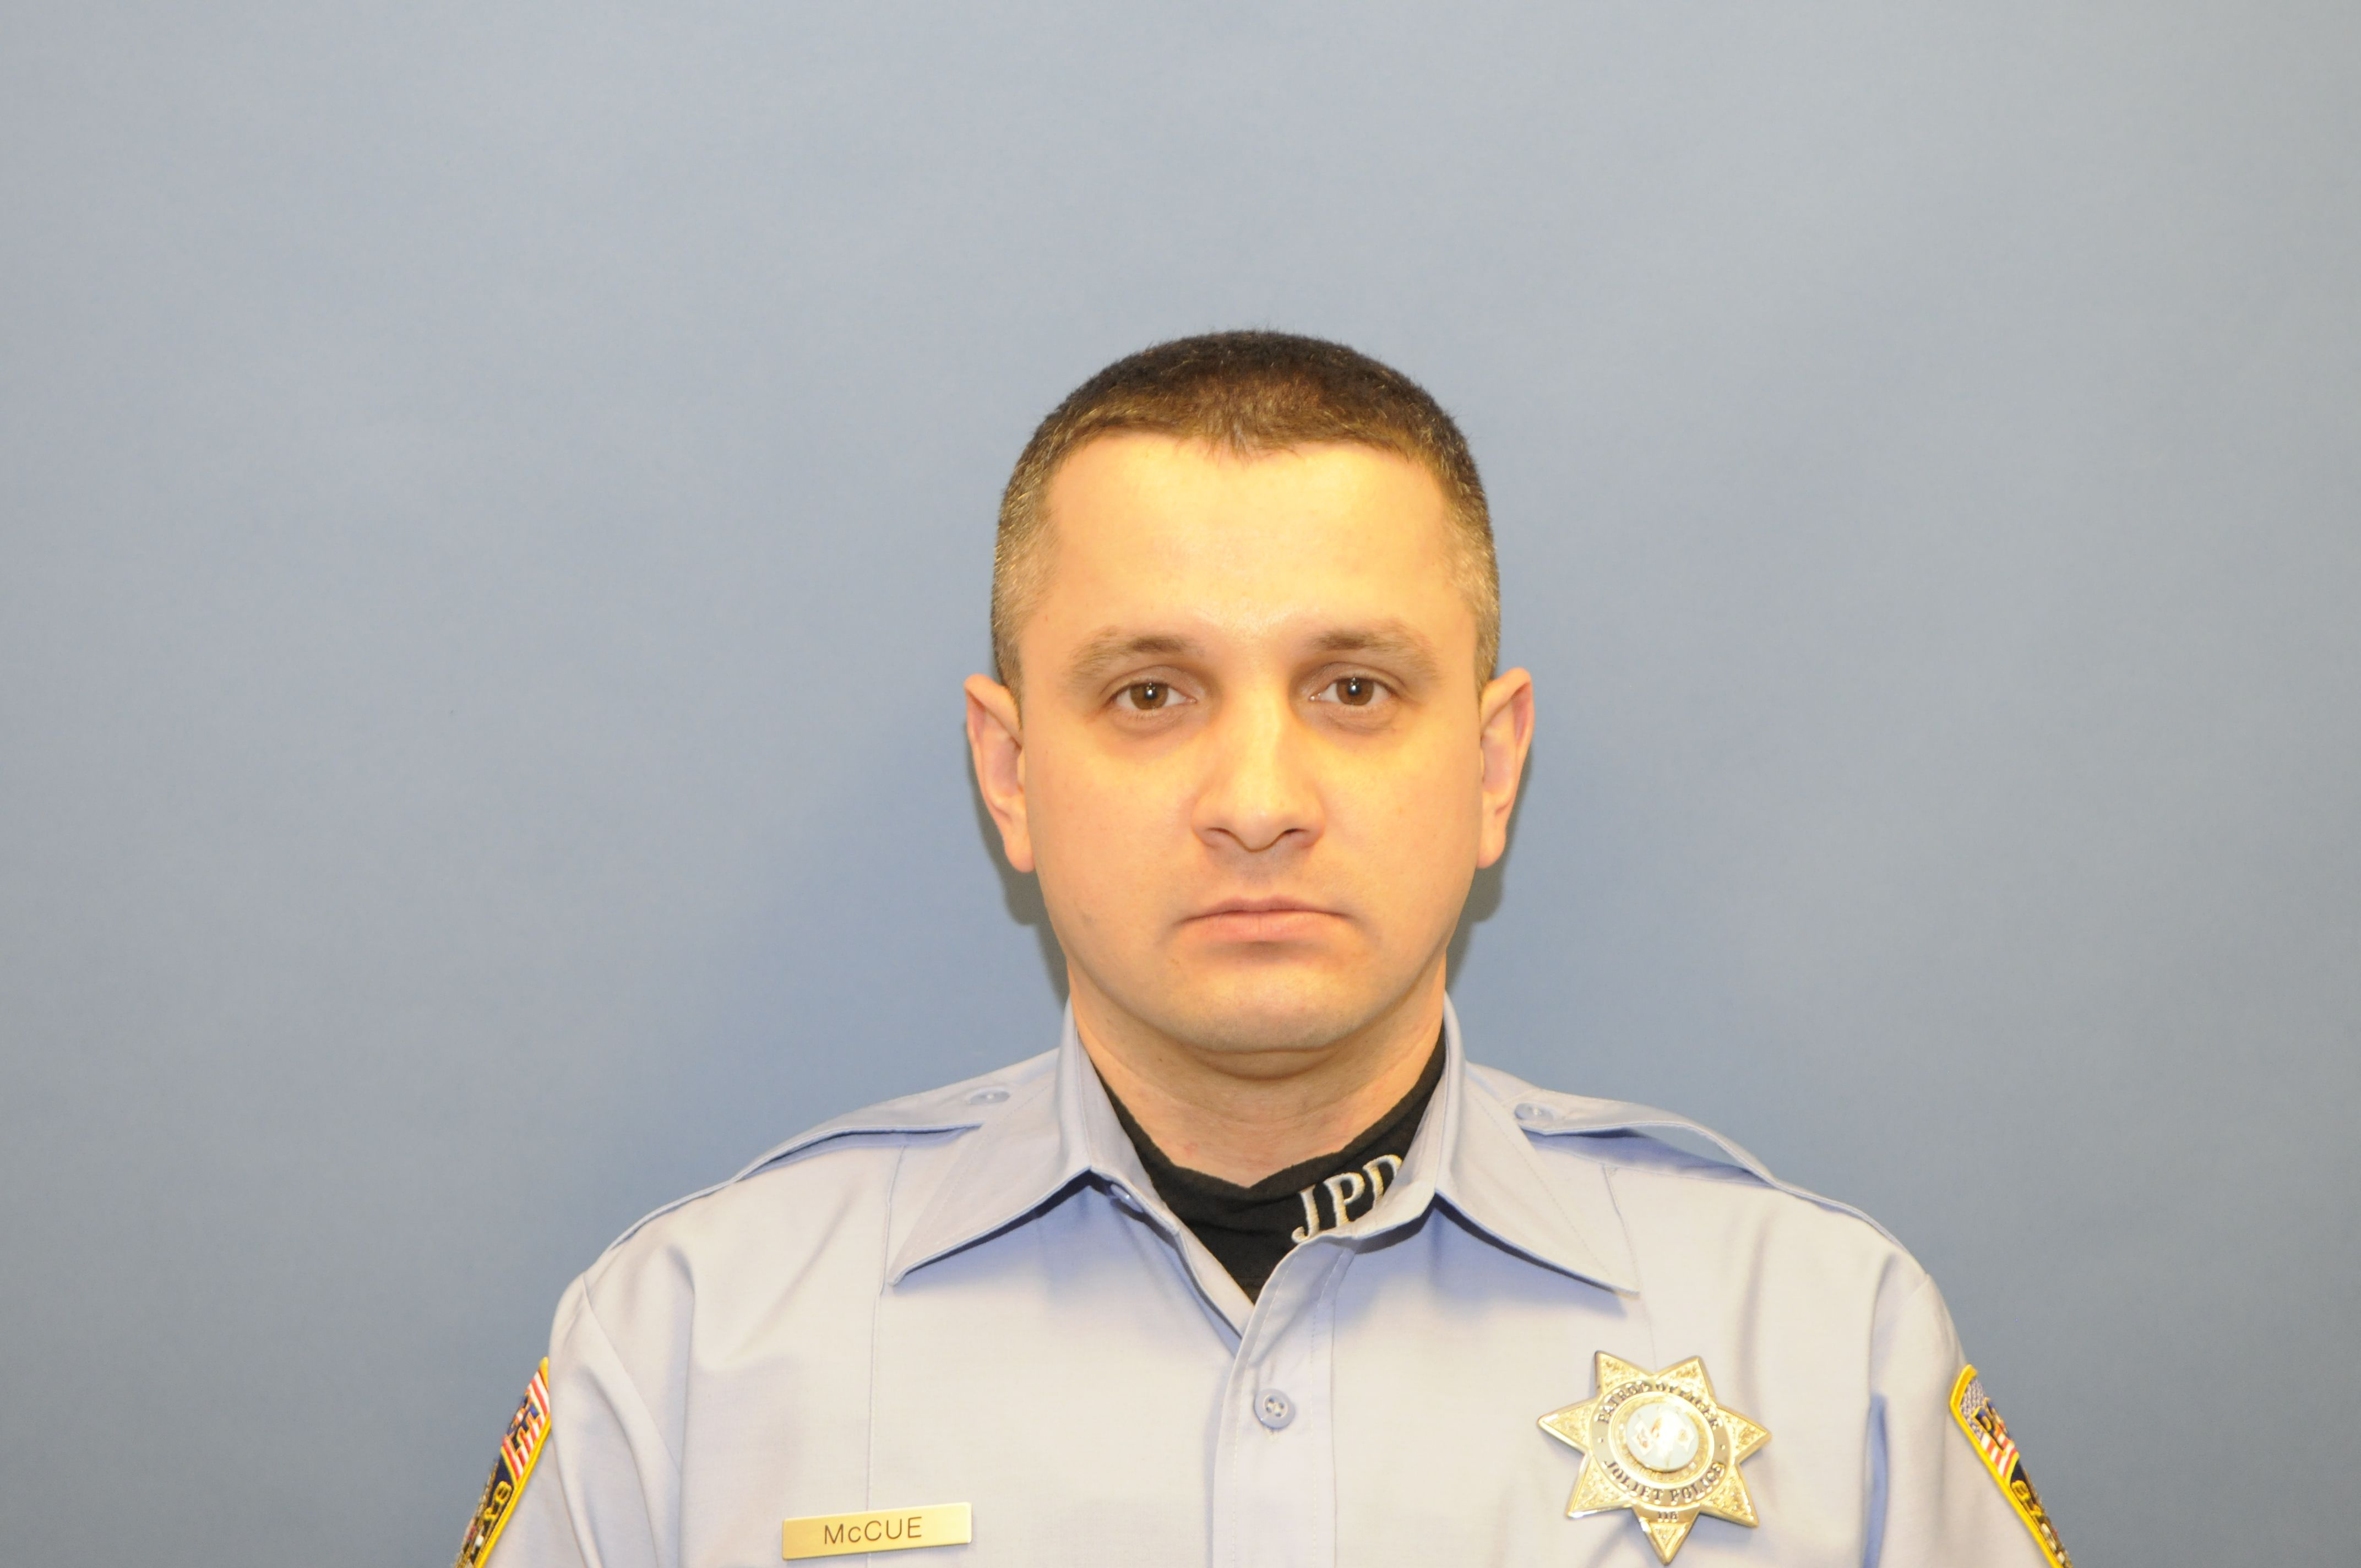 Joliet Police Officer Andrew McCue